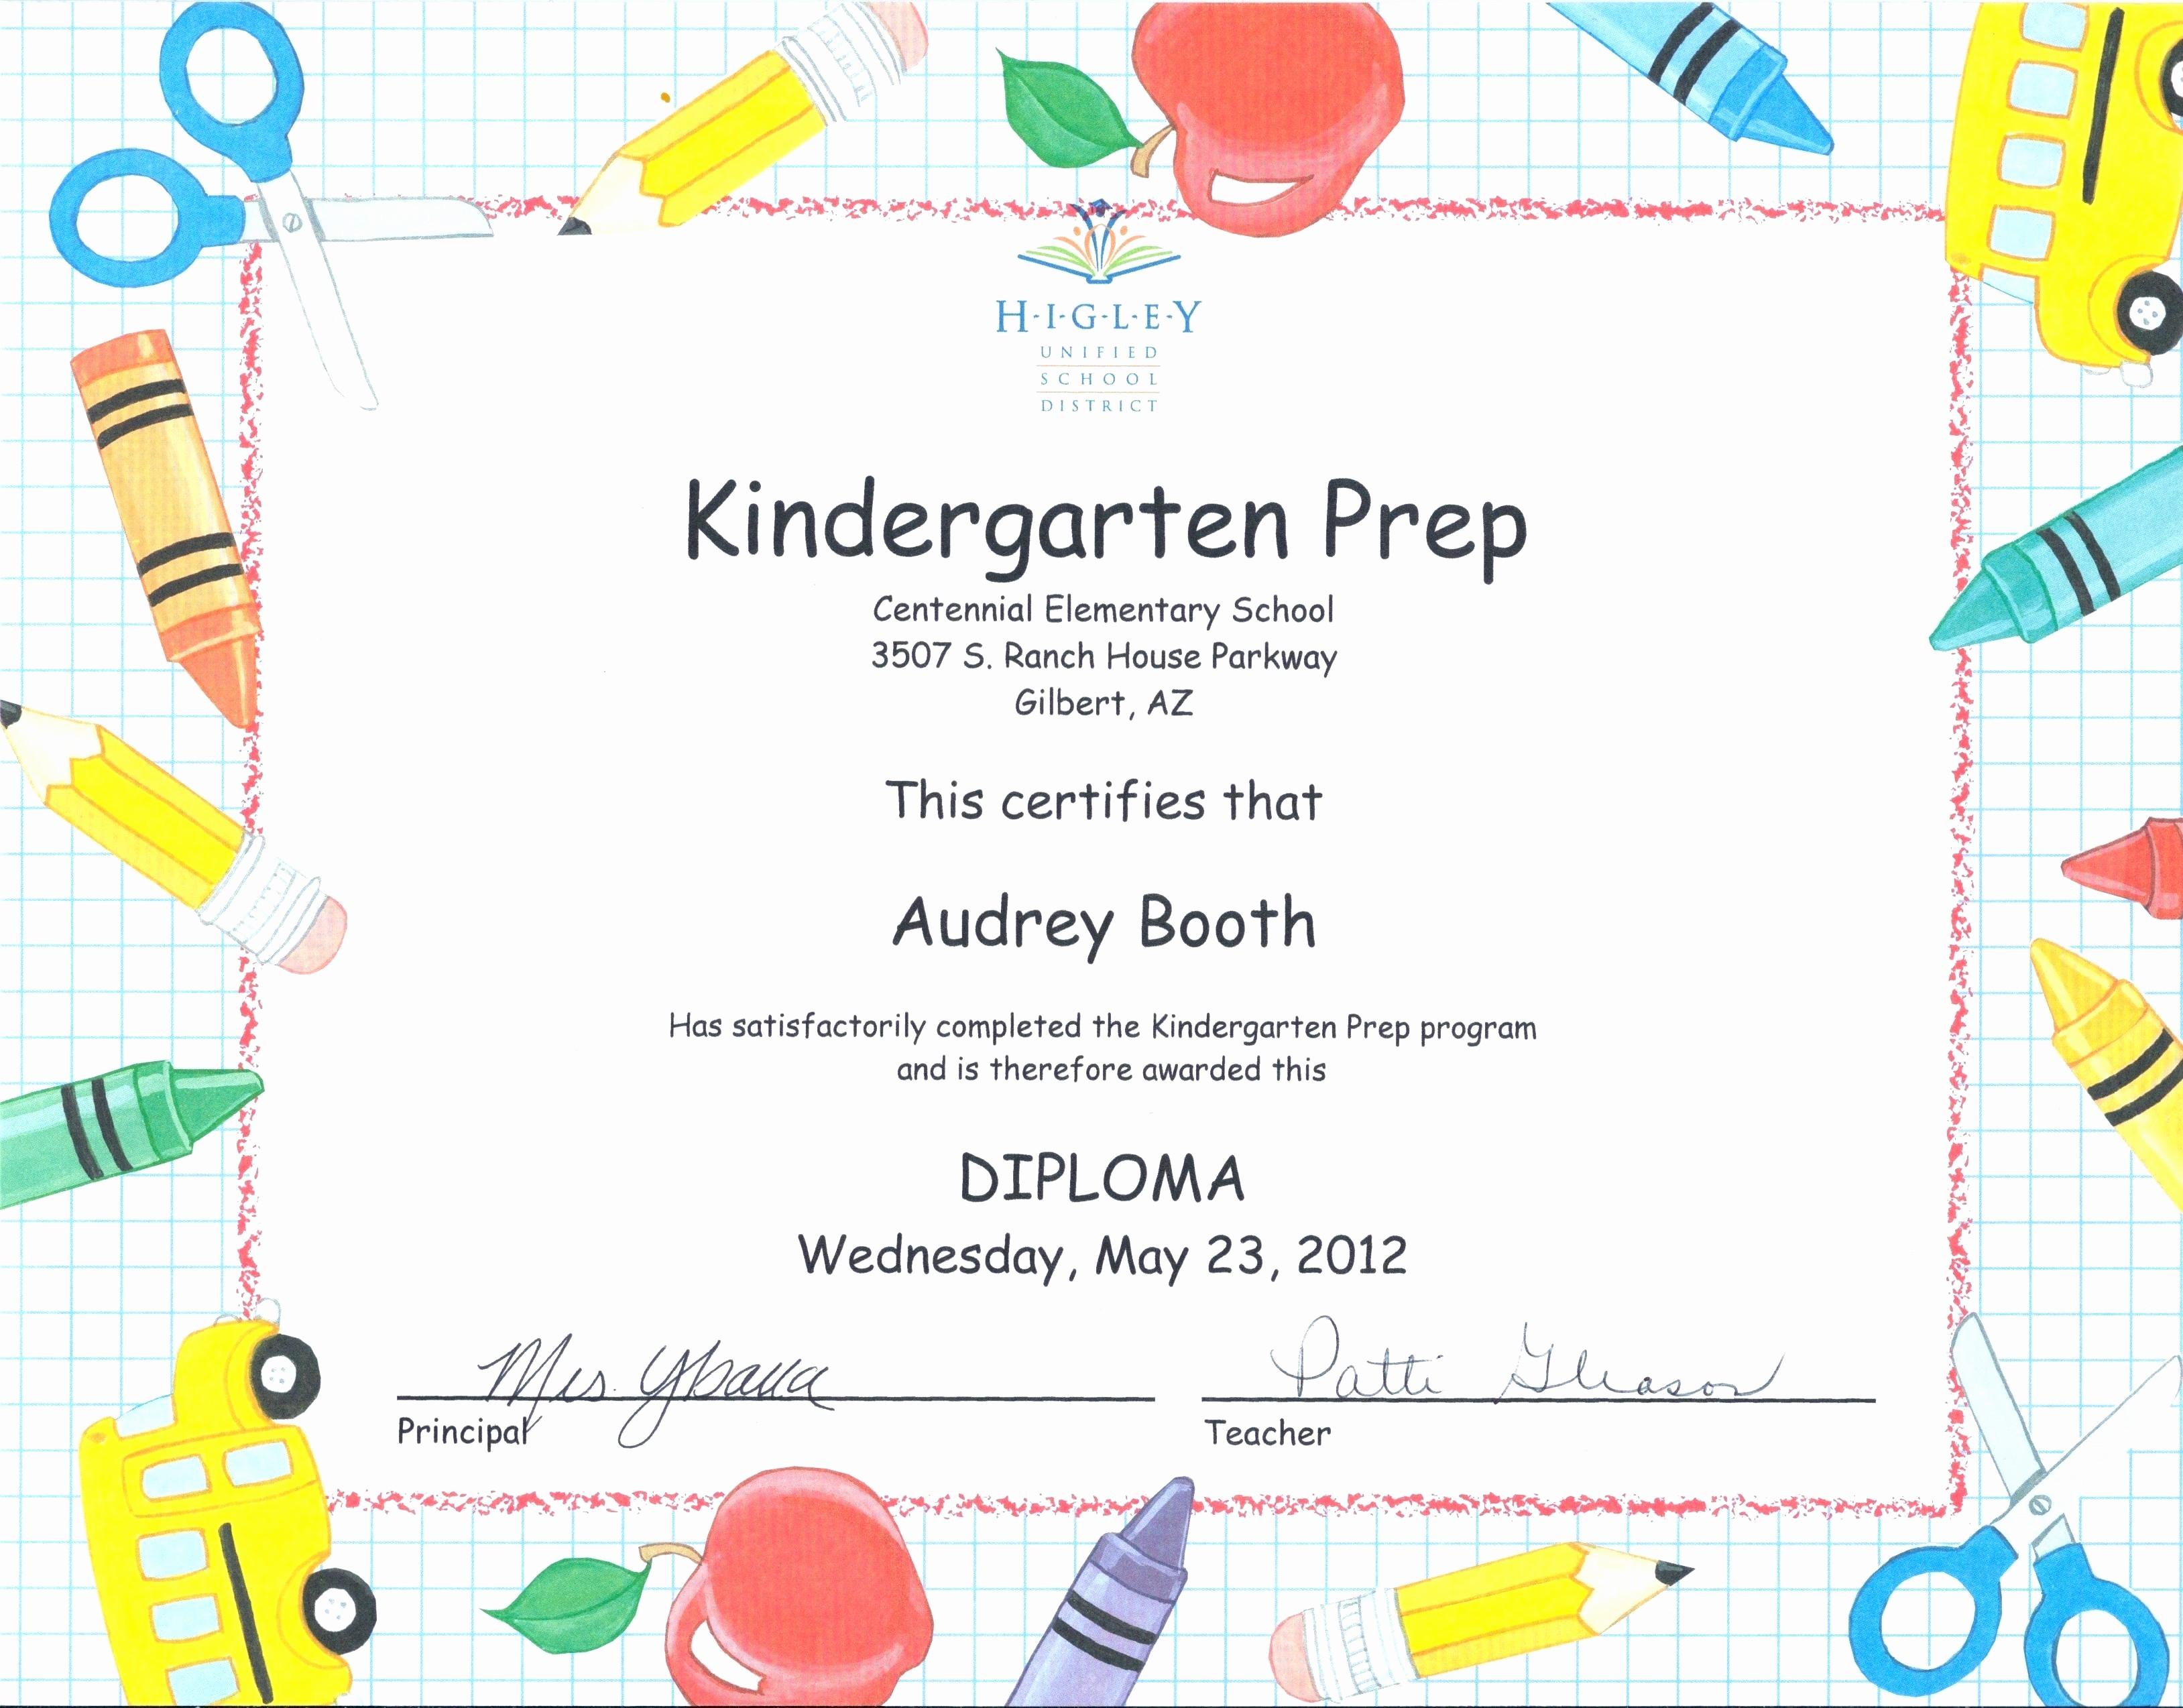 Free Printable Kindergarten Certificate Templates Luxury Template Preschool Graduation Diploma Template